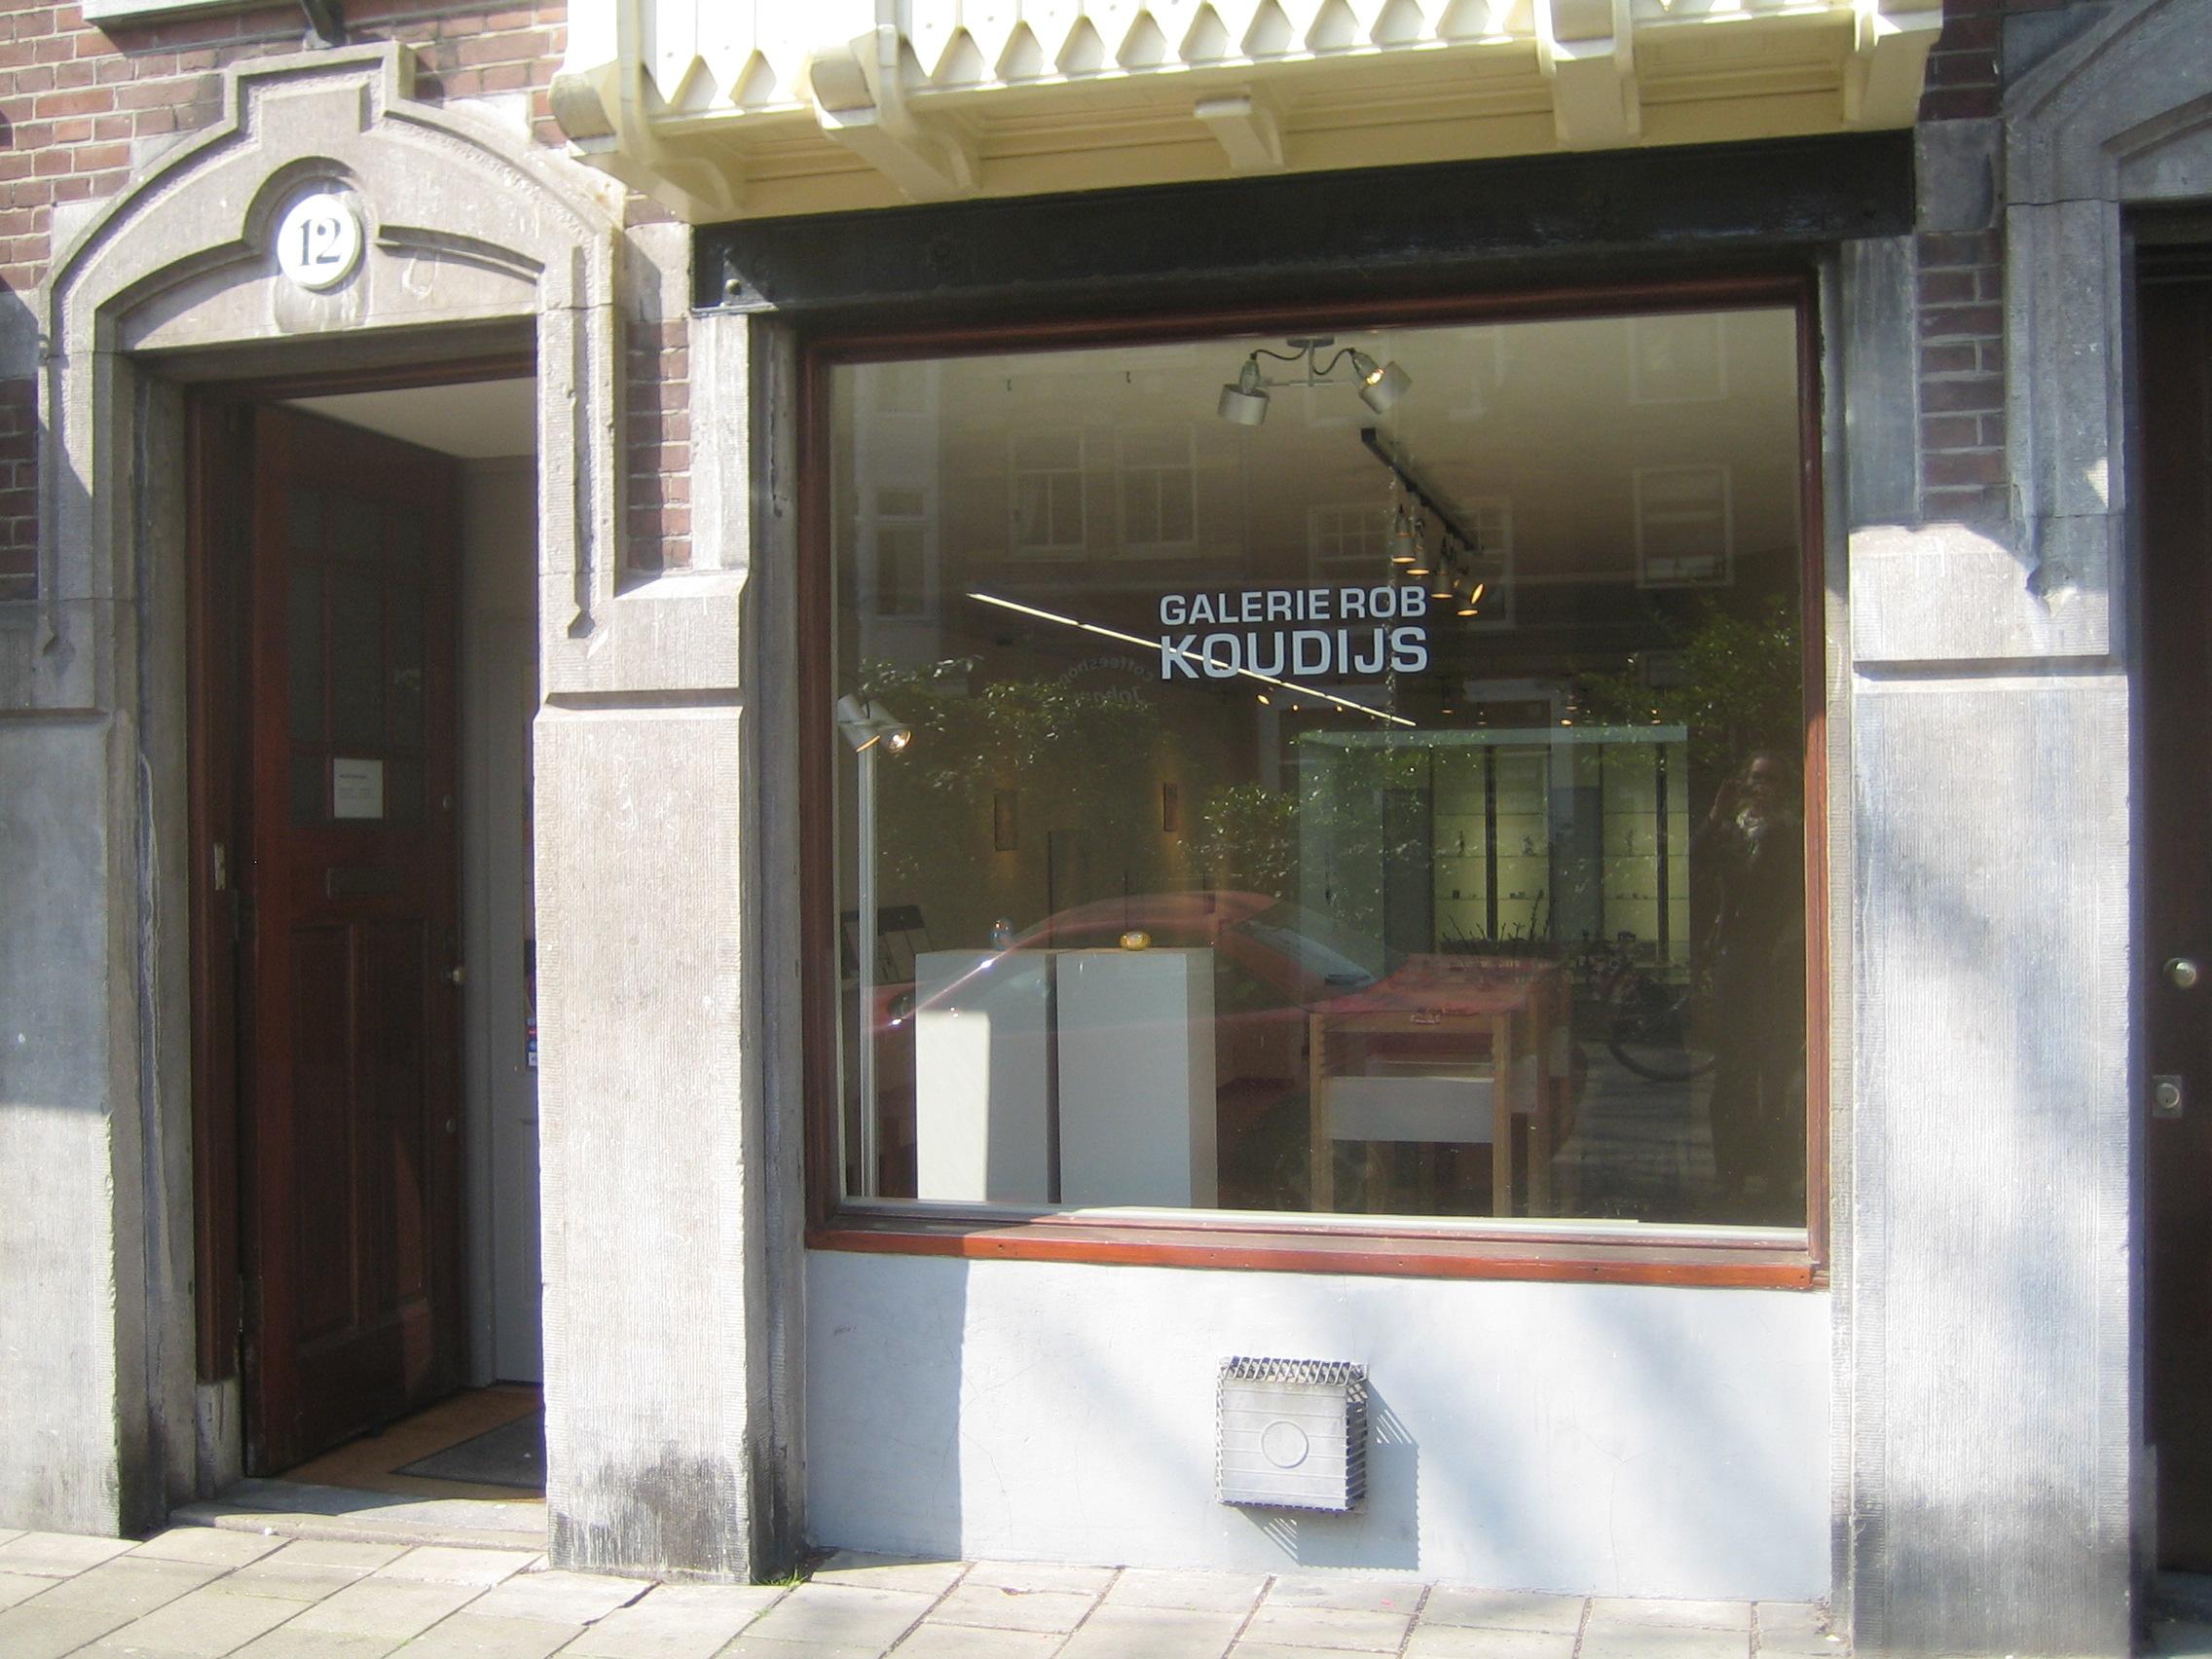 Galerie Rob Koudijs, Elandsgracht Amsterdam, 2015, gevel